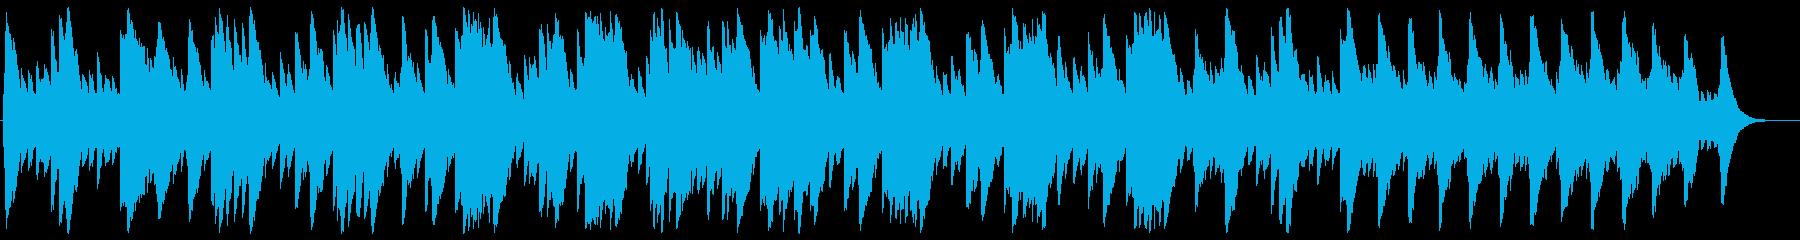 Avemari (Schubert)'s reproduced waveform